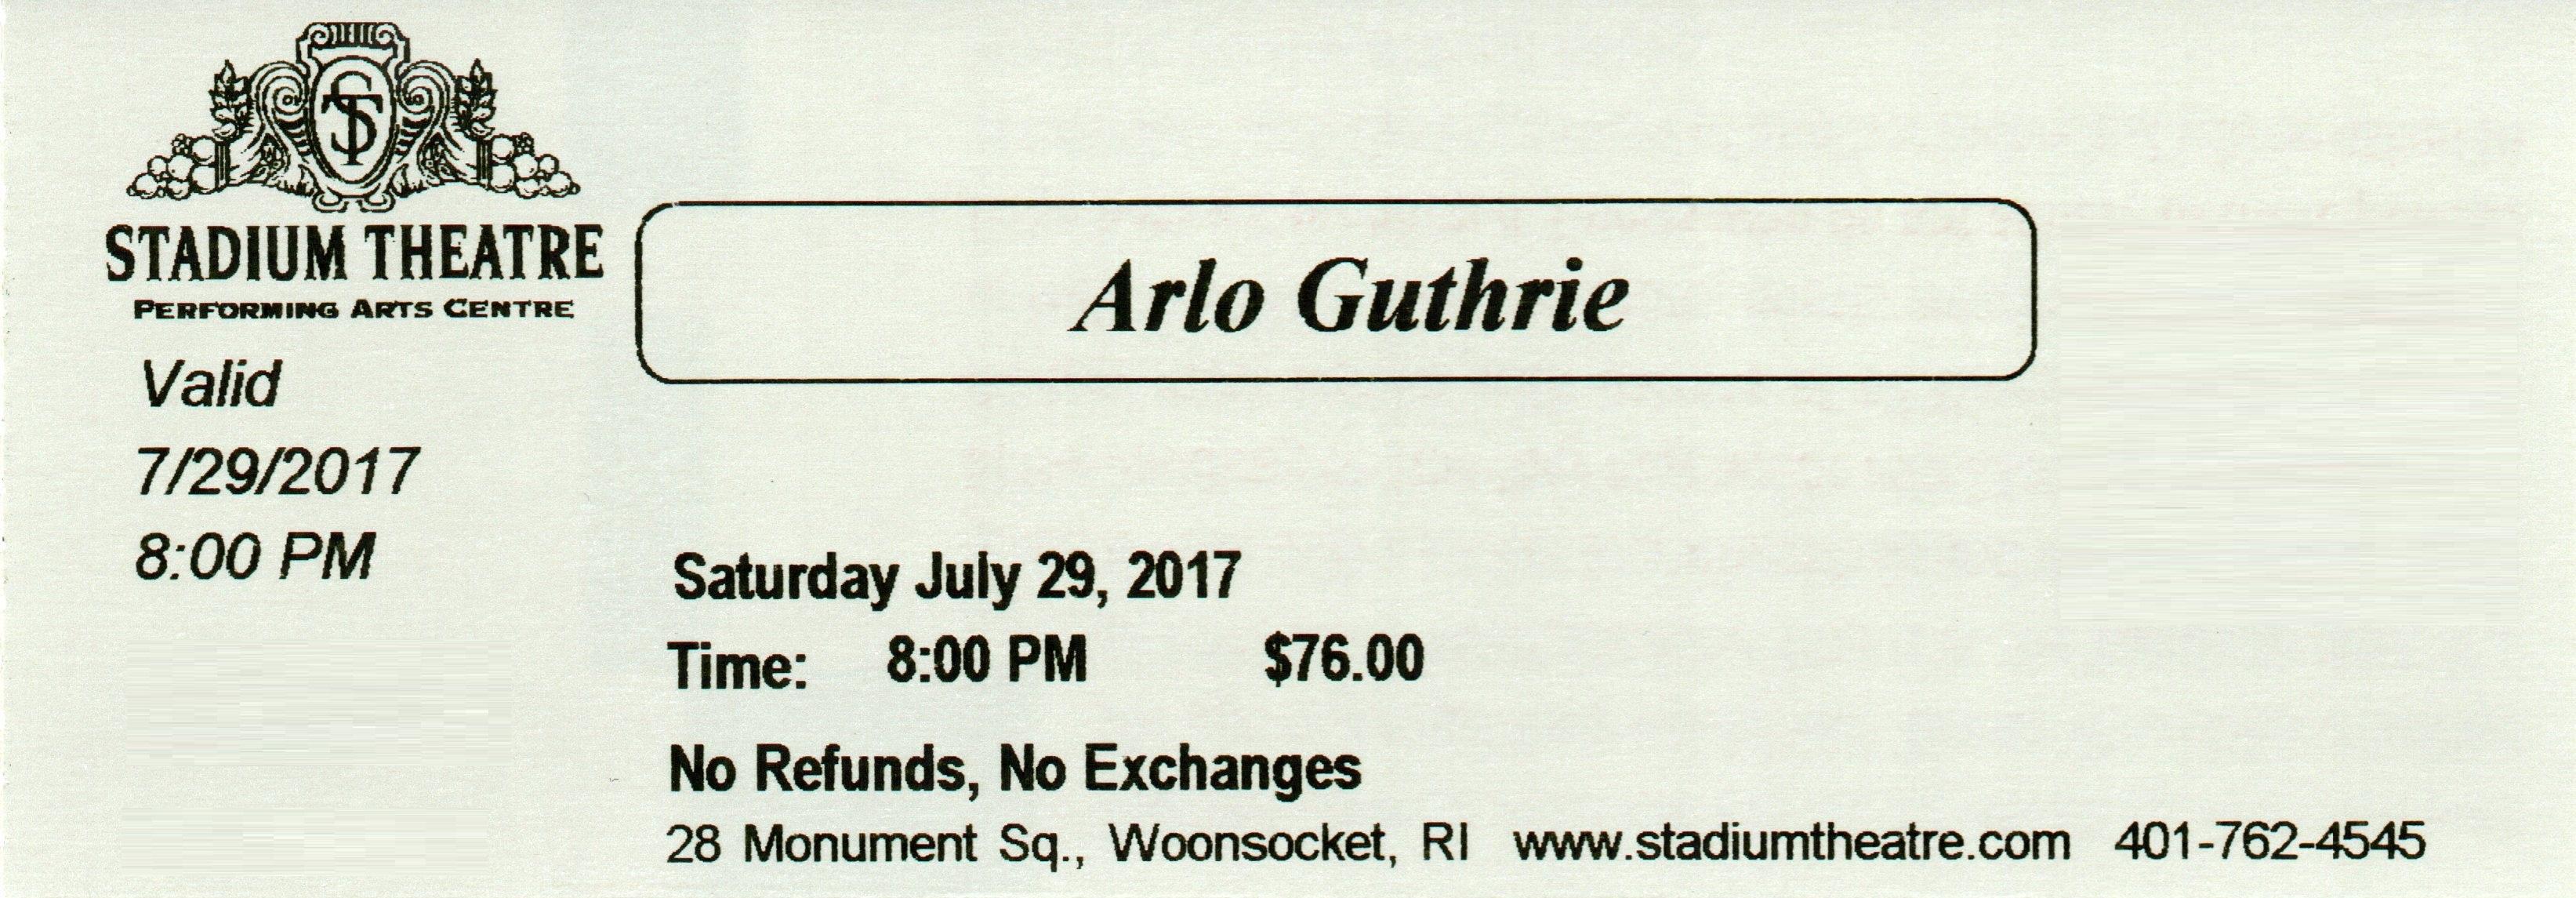 ArloGuthrie2017-07-29StadiumTheaterPerformingArtsCenterWoonsocketRI.jpg